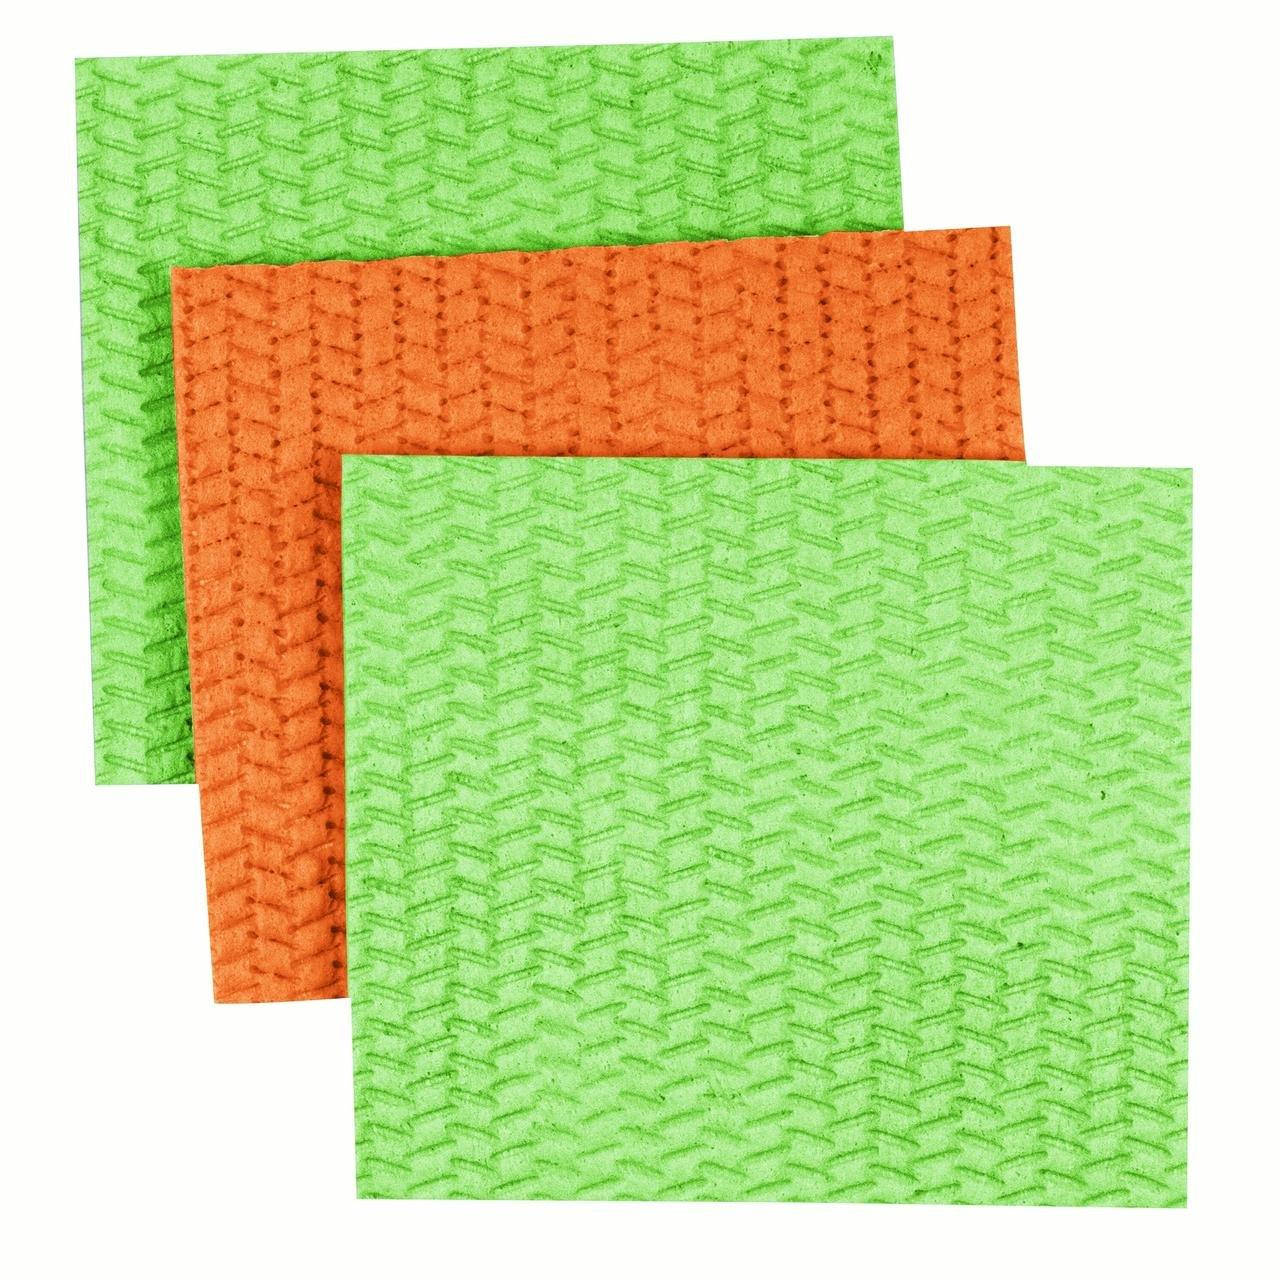 Casabella Lime and Orange Assorted Large Cellulose Sponge Cloths, Pack of 3 by Cásabella (Image #1)